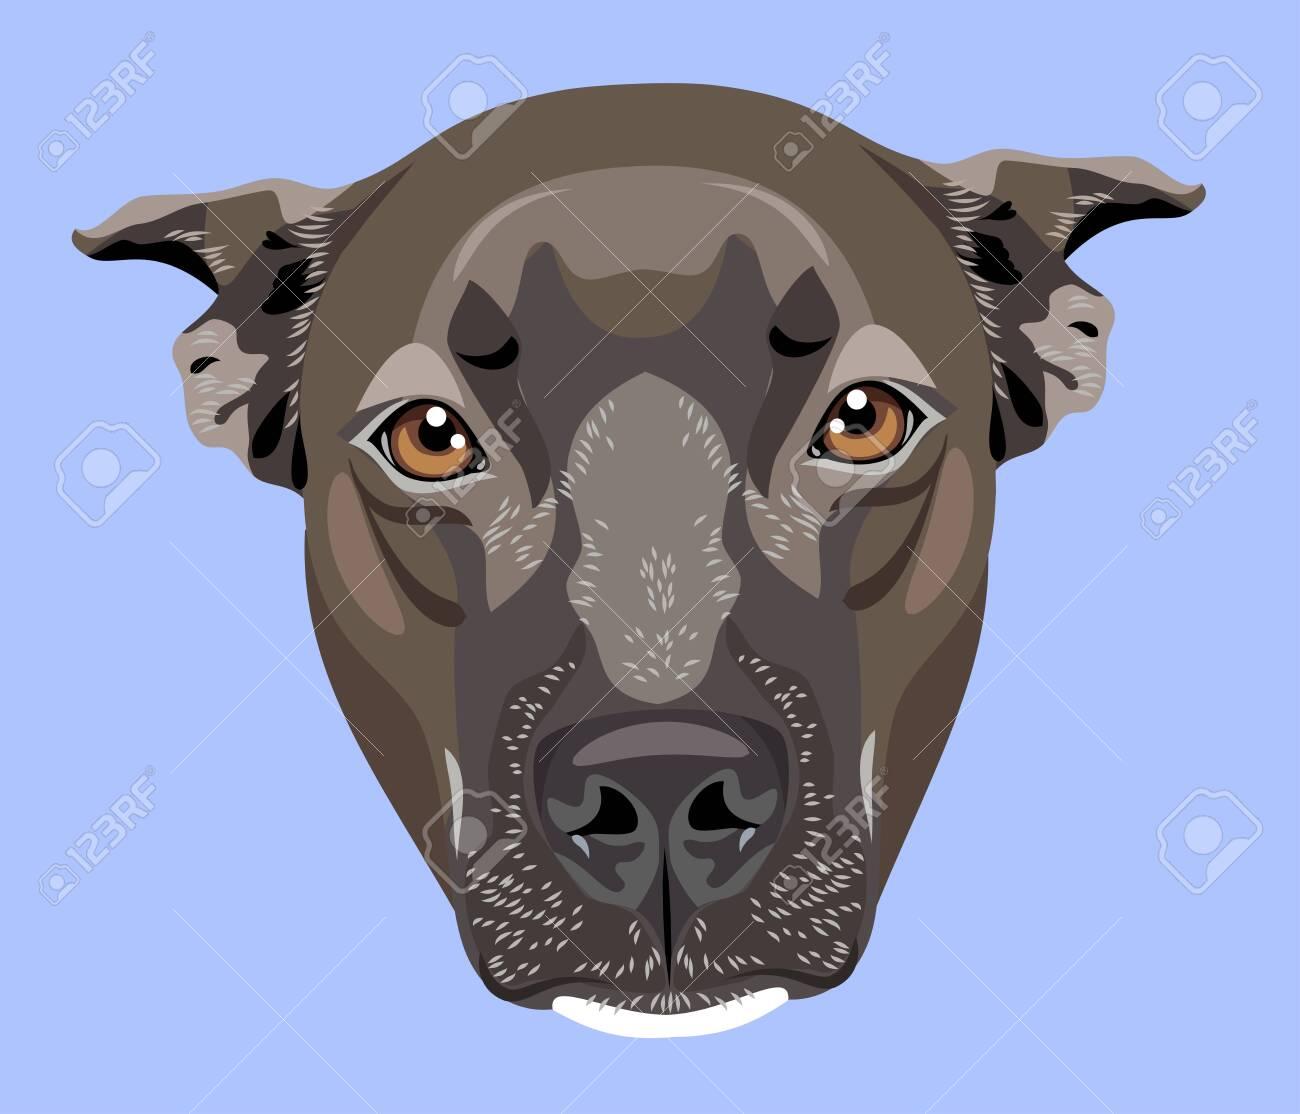 cute portrait of a dog pit bull terrier (american bulldog) - 130800592